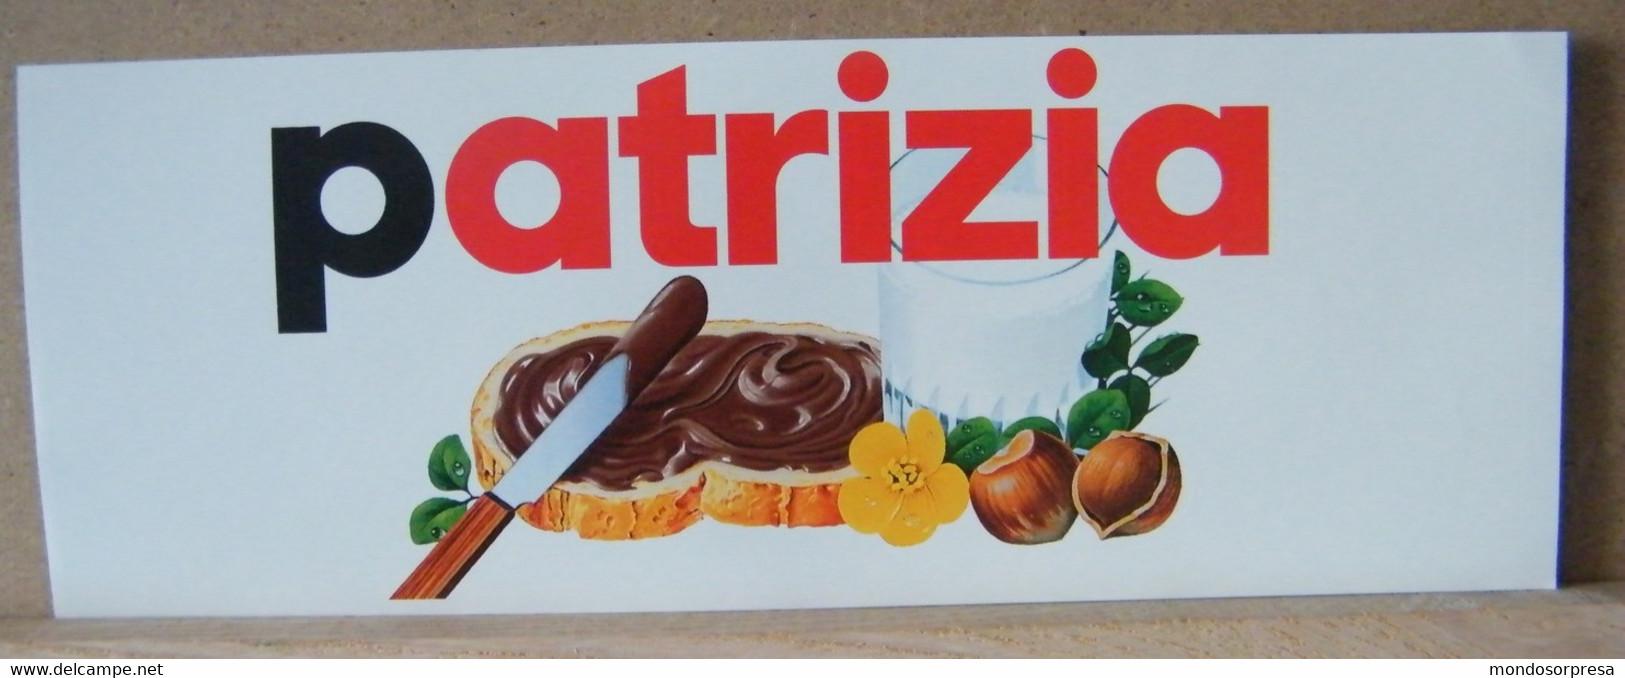 MONDOSORPRESA, ADESIVI NUTELLA NOMI, PATRIZIA - Nutella